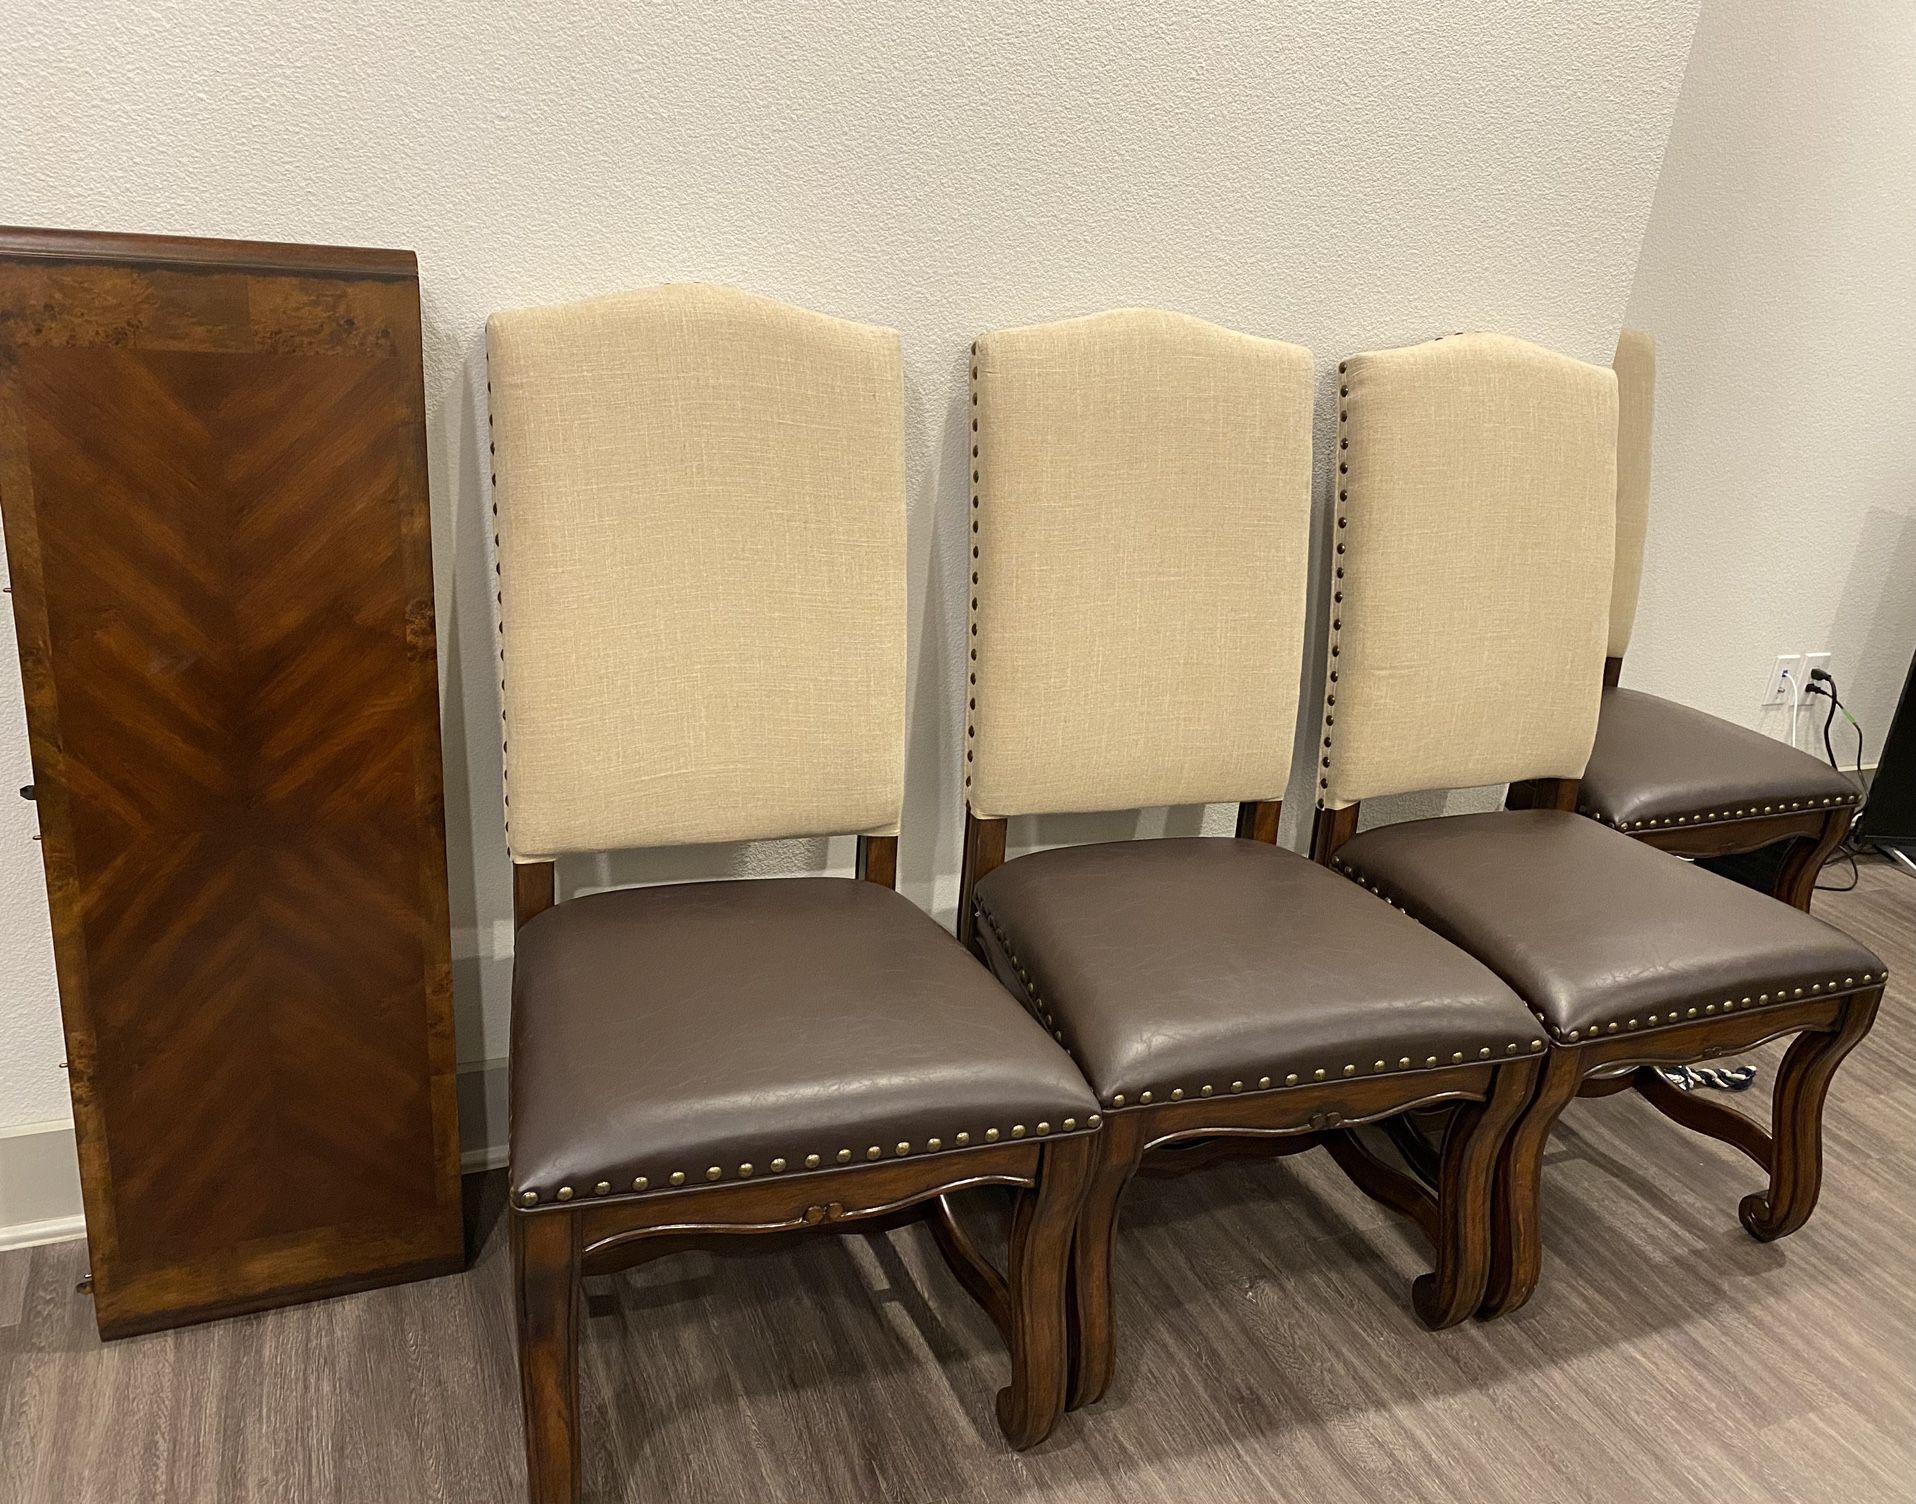 Bel Furniture Dining Table